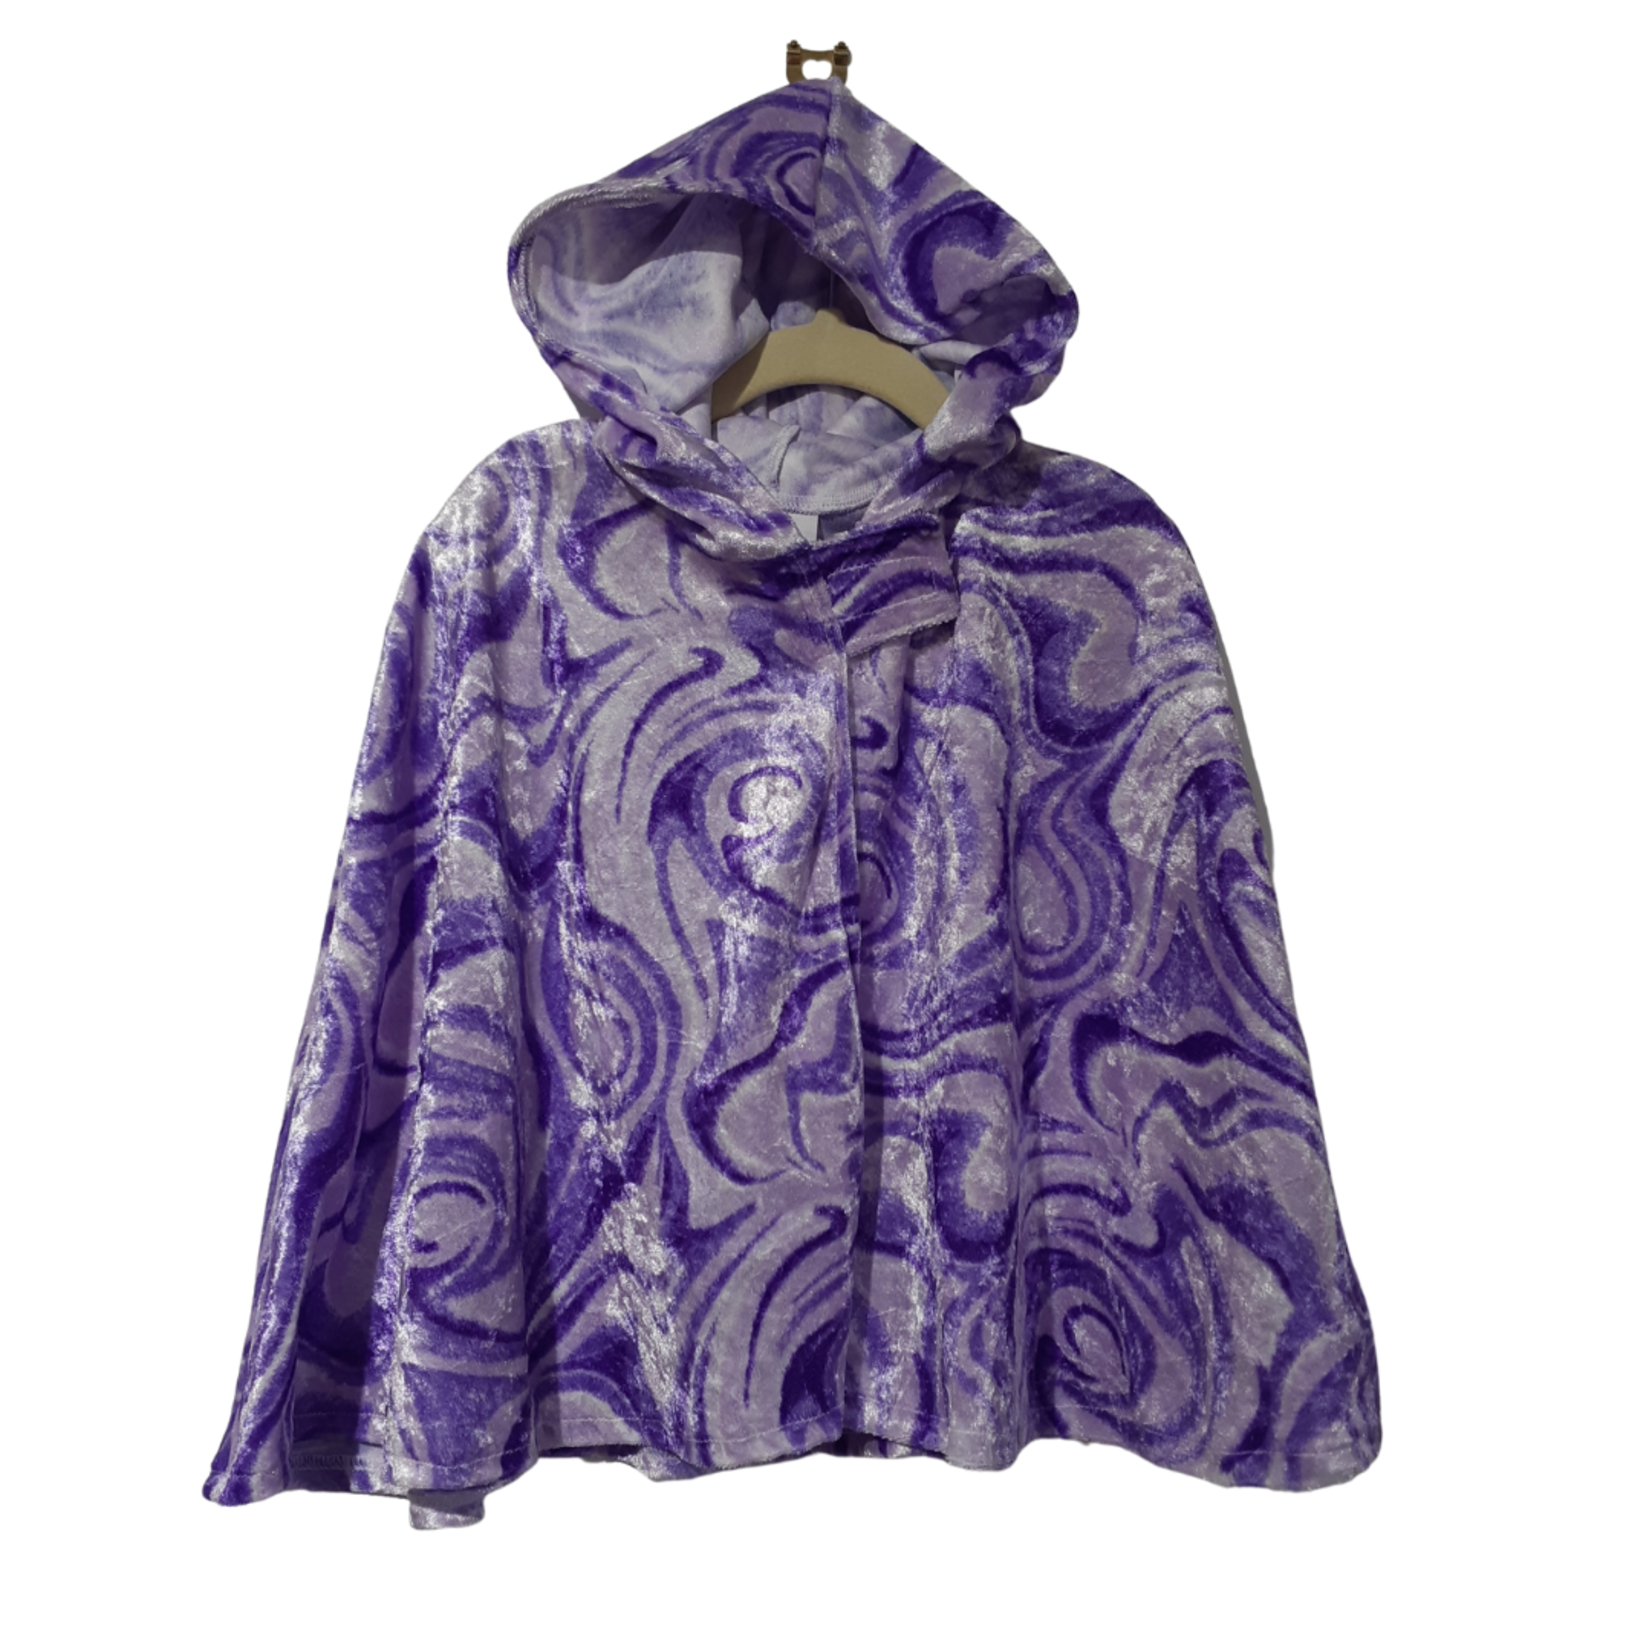 Wacky Wardrobe Wacky Wardrobe Cape Purple Swirl - Small